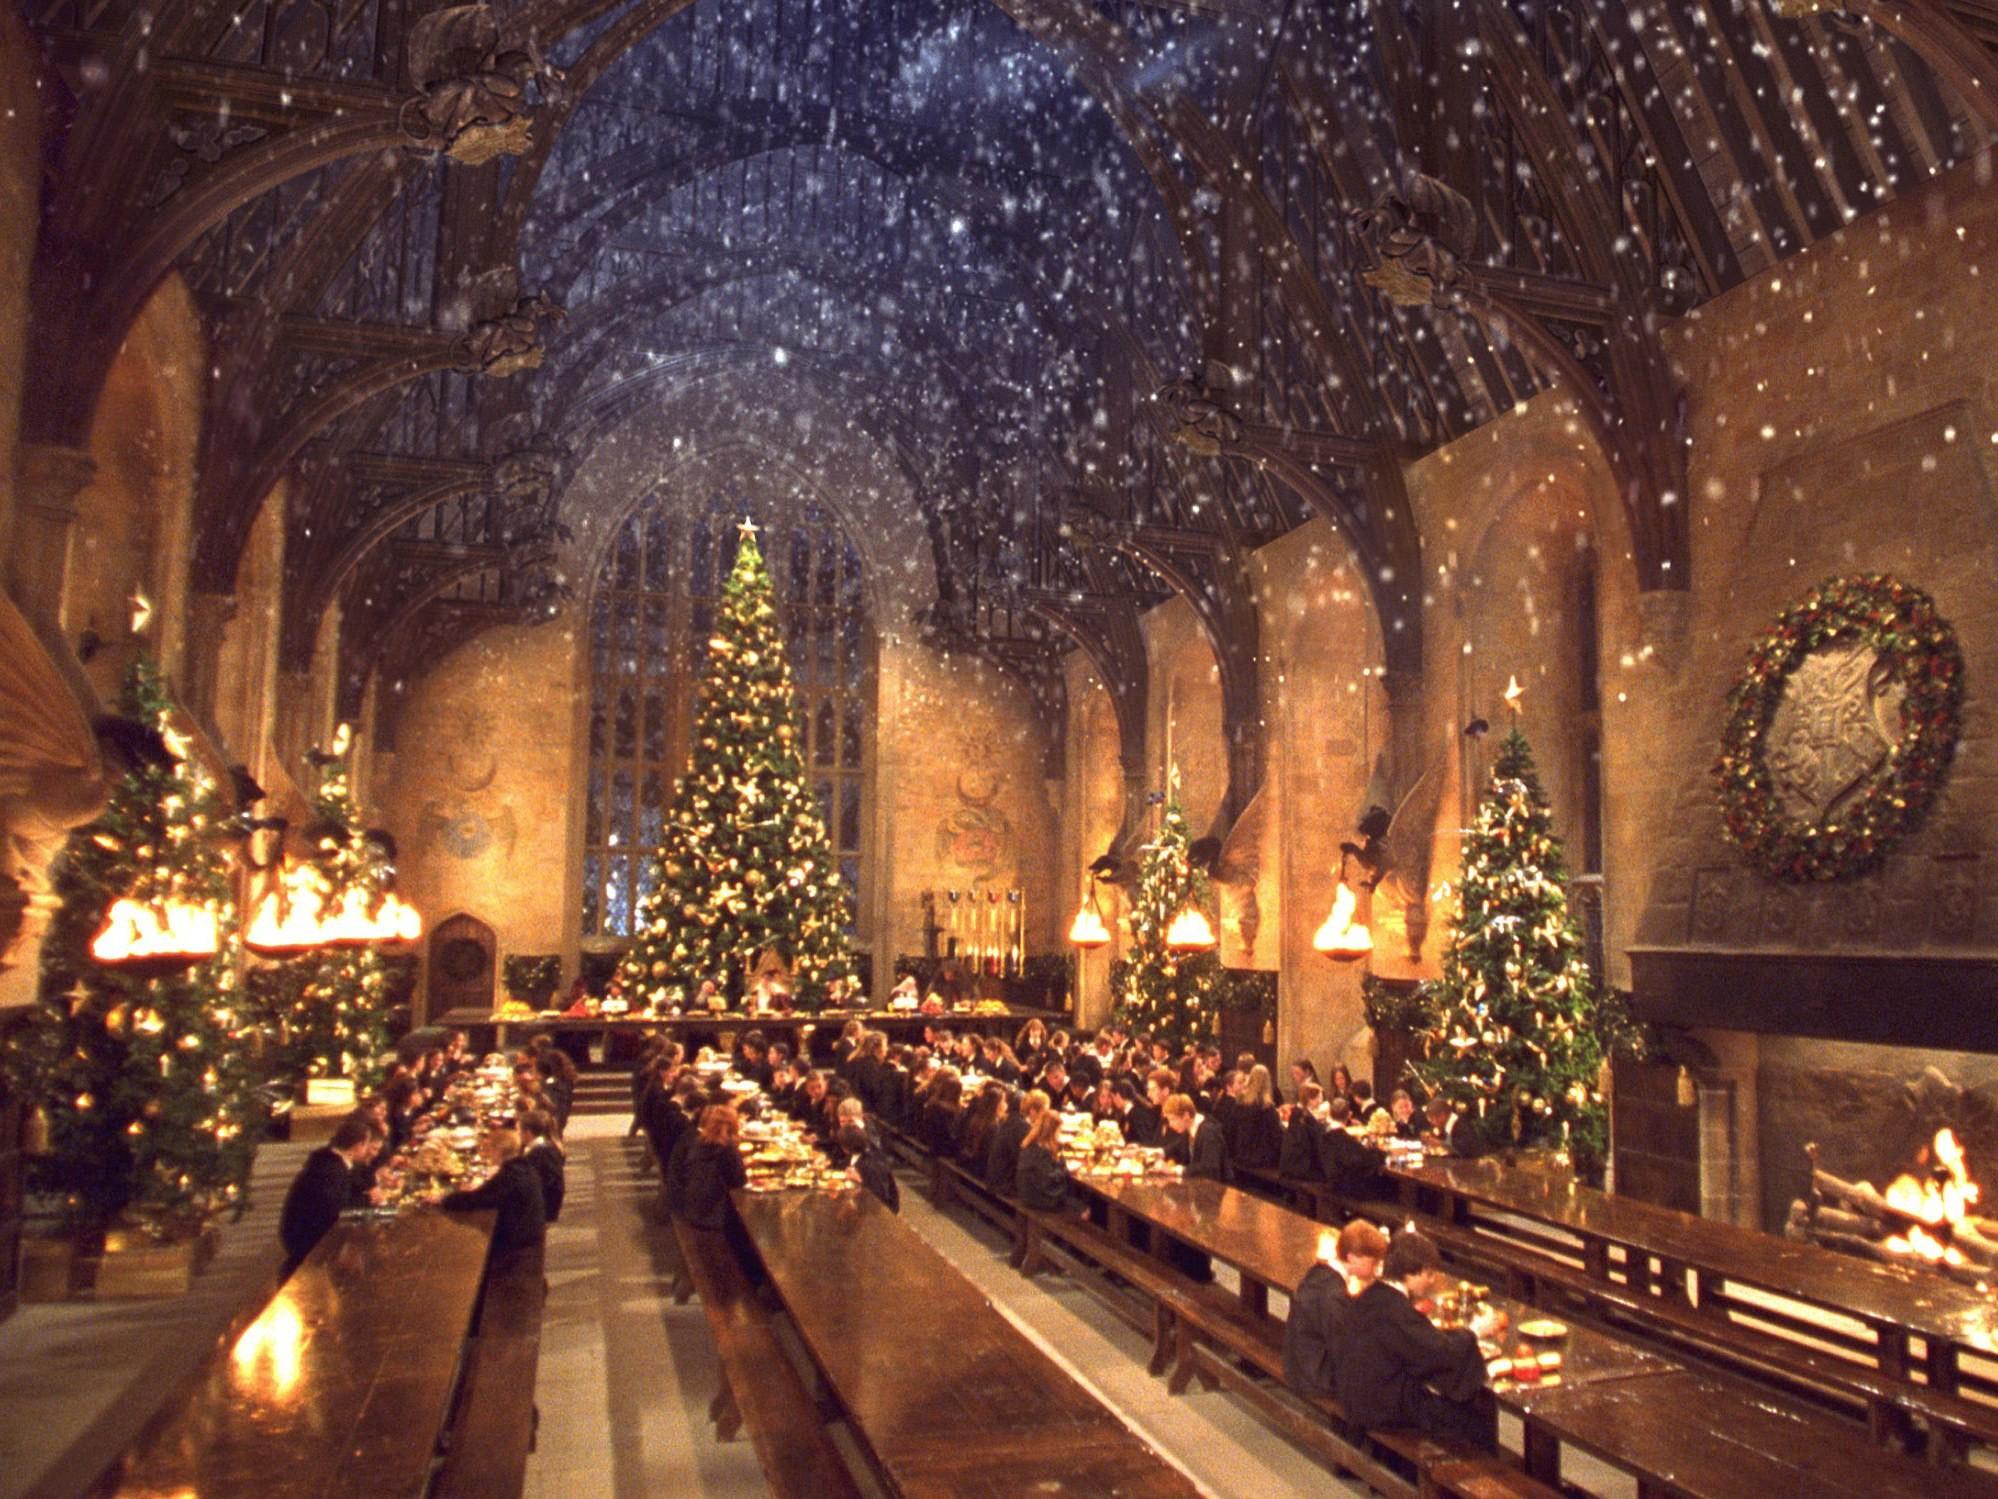 Have a Candlelit Christmas Dinner at Harry Potter's Hogwarts РCond̩ Nast  Traveler